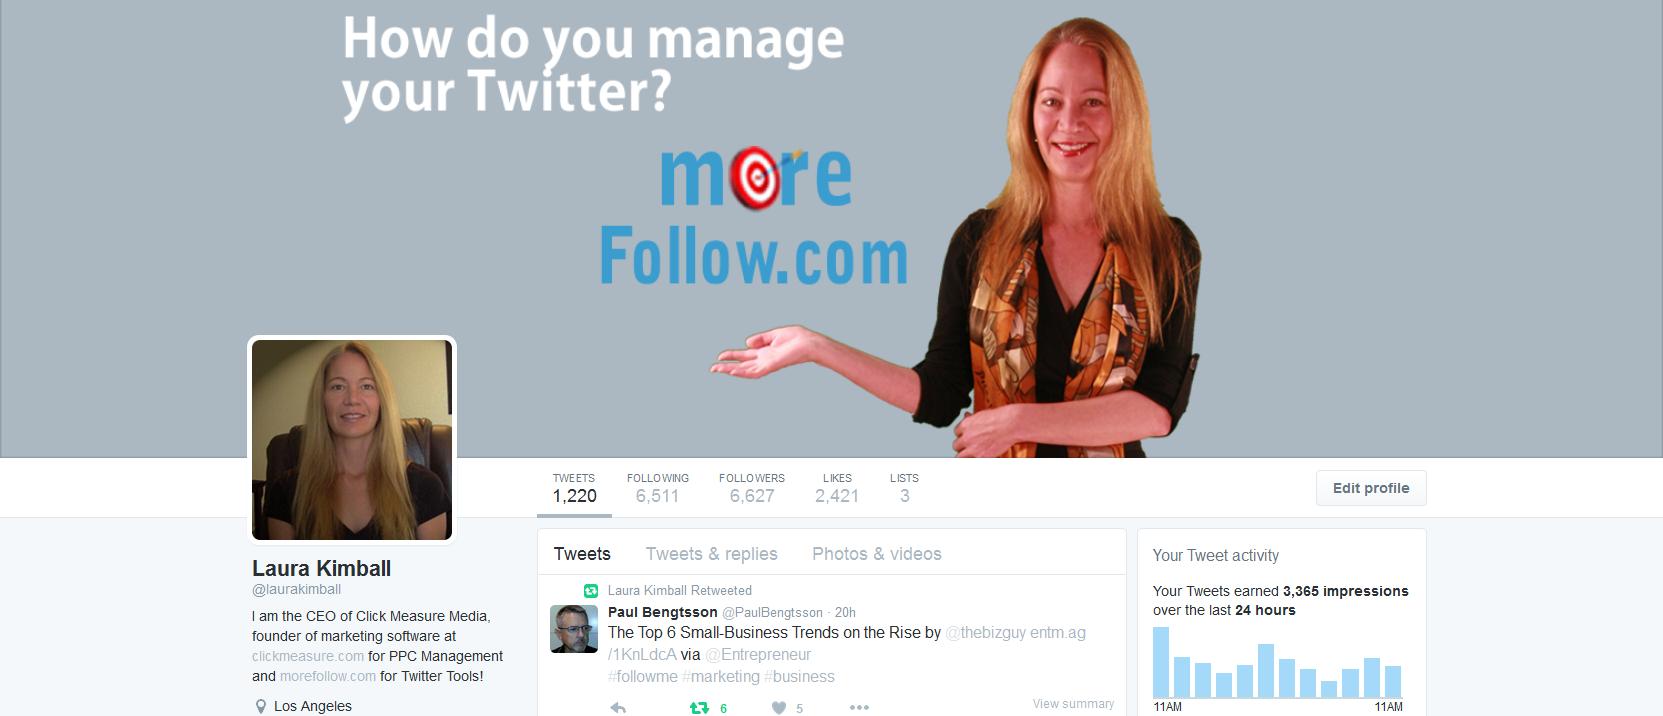 Laura Kimball Twitter Profile